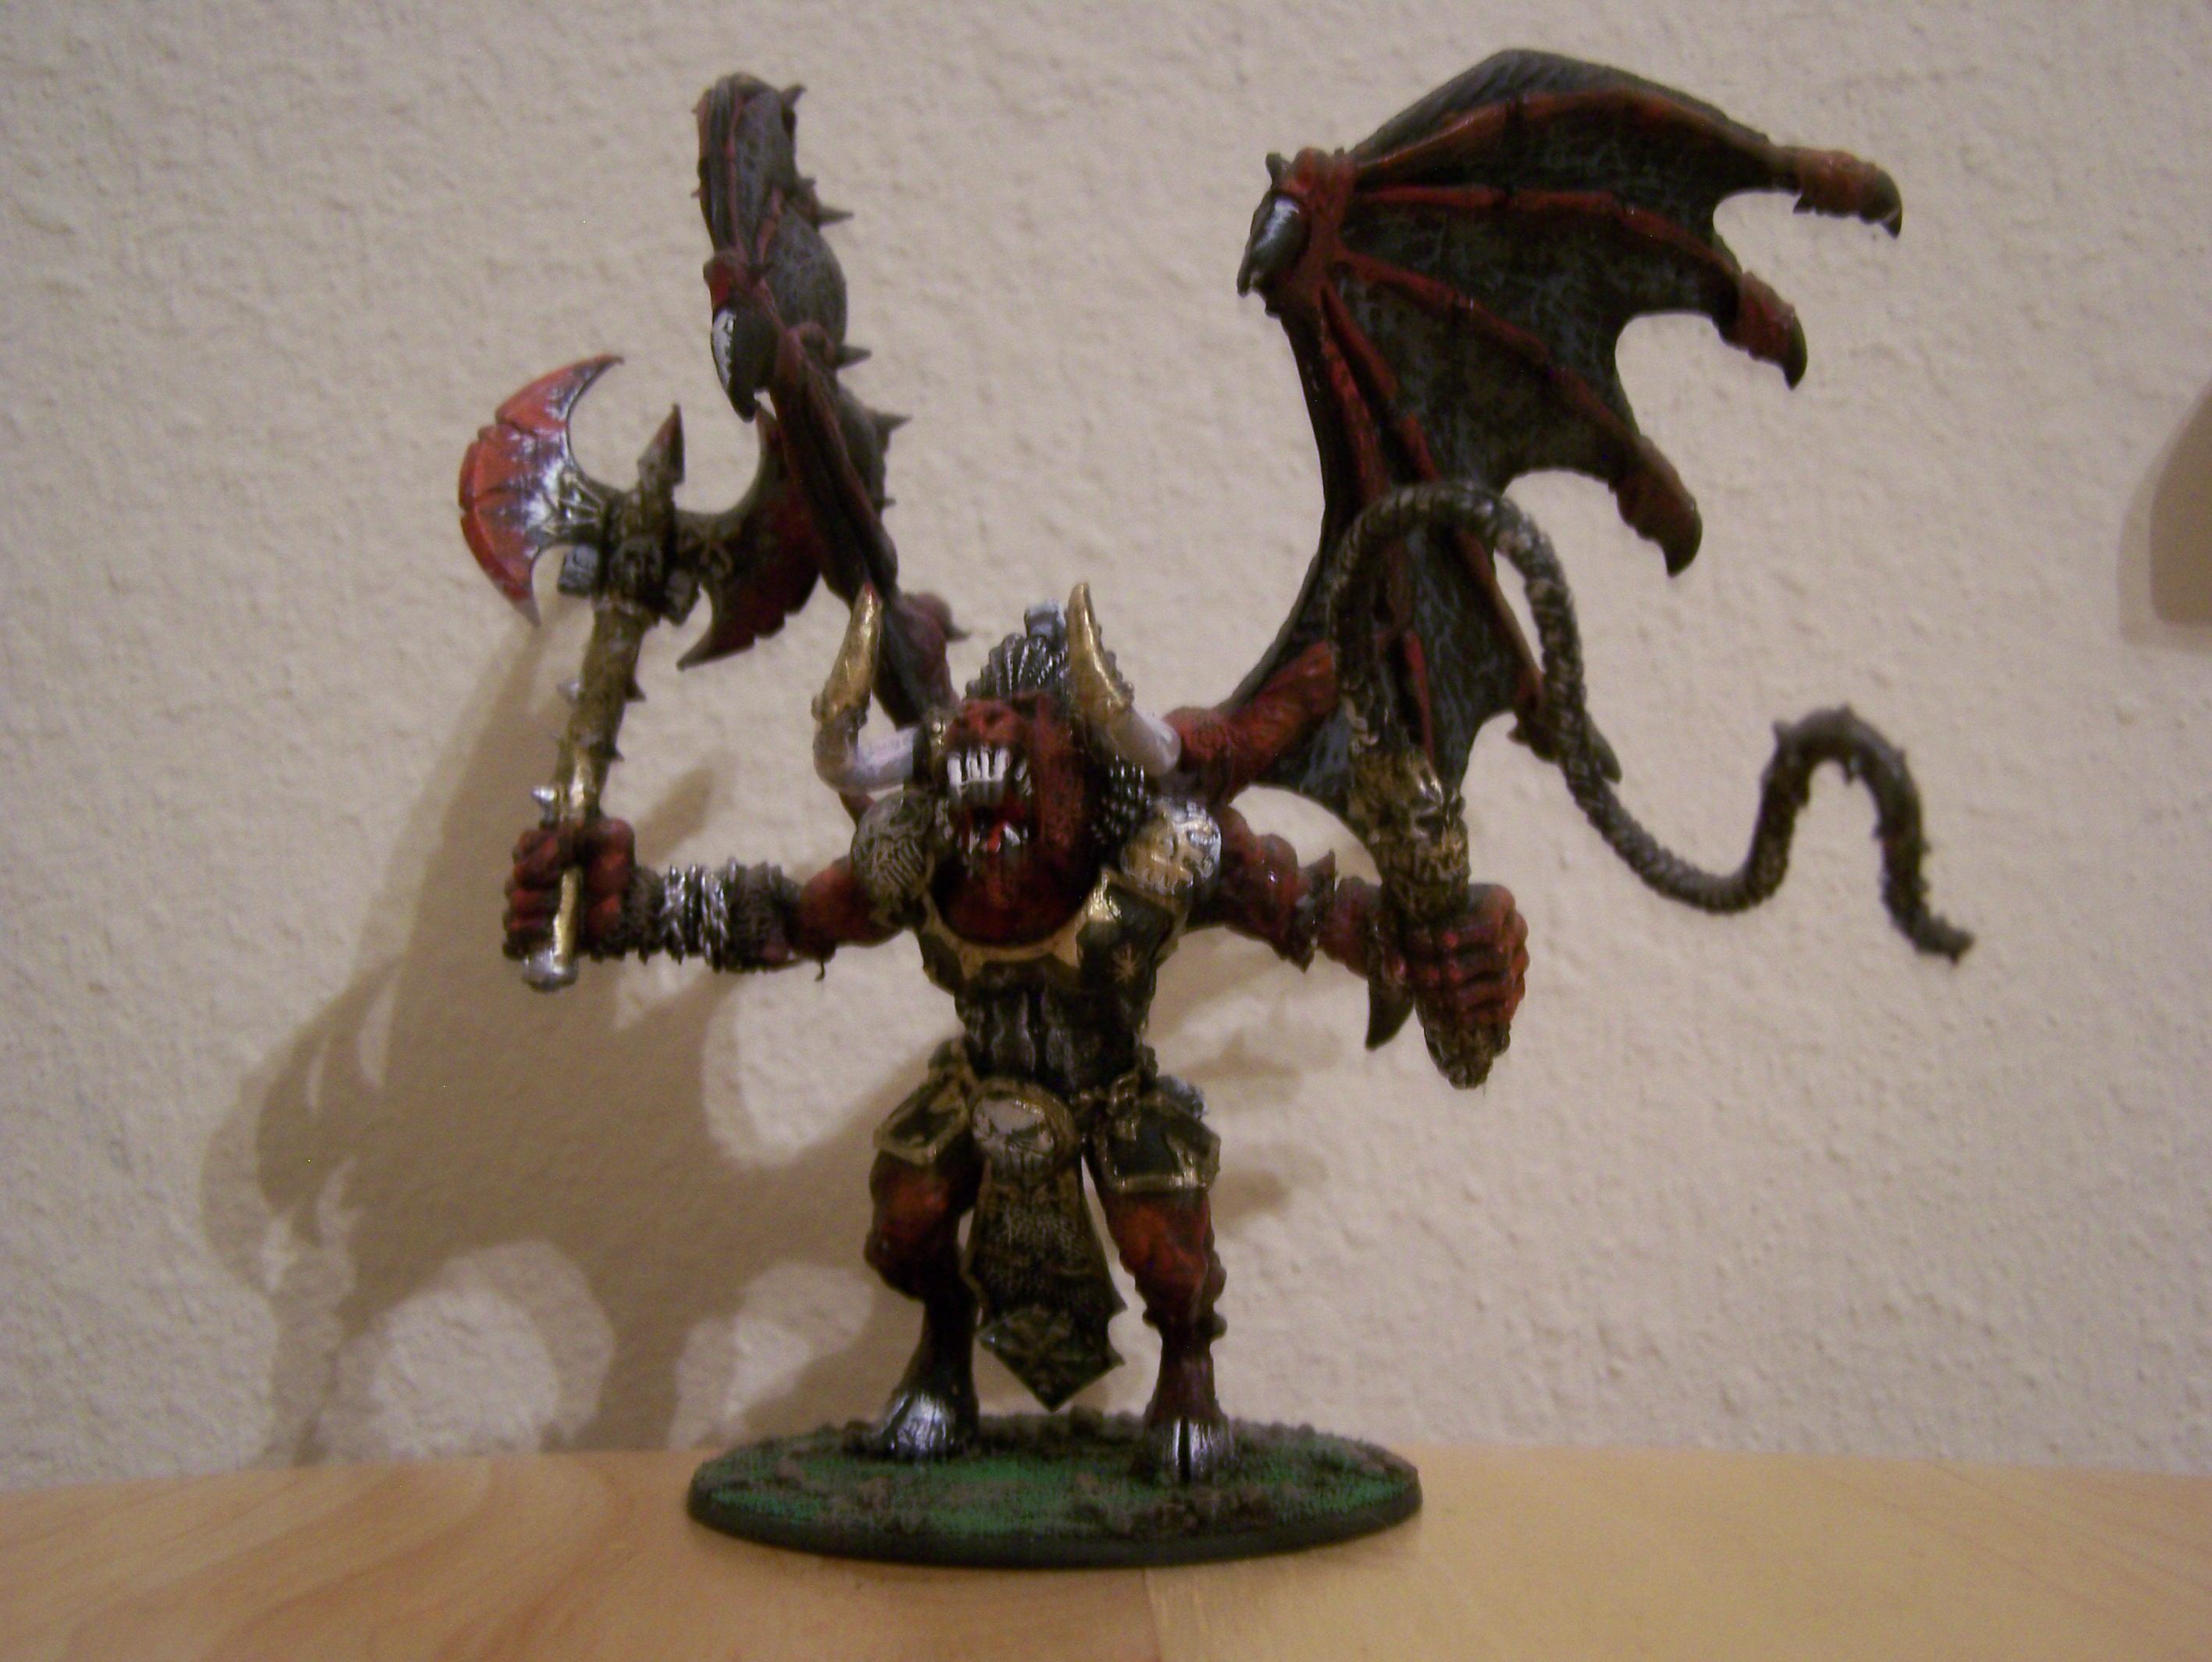 Bloodthirster, Blurred Photo, Daemons, First Model, Khorne, Warhammer 40,000, Warhammer Fantasy